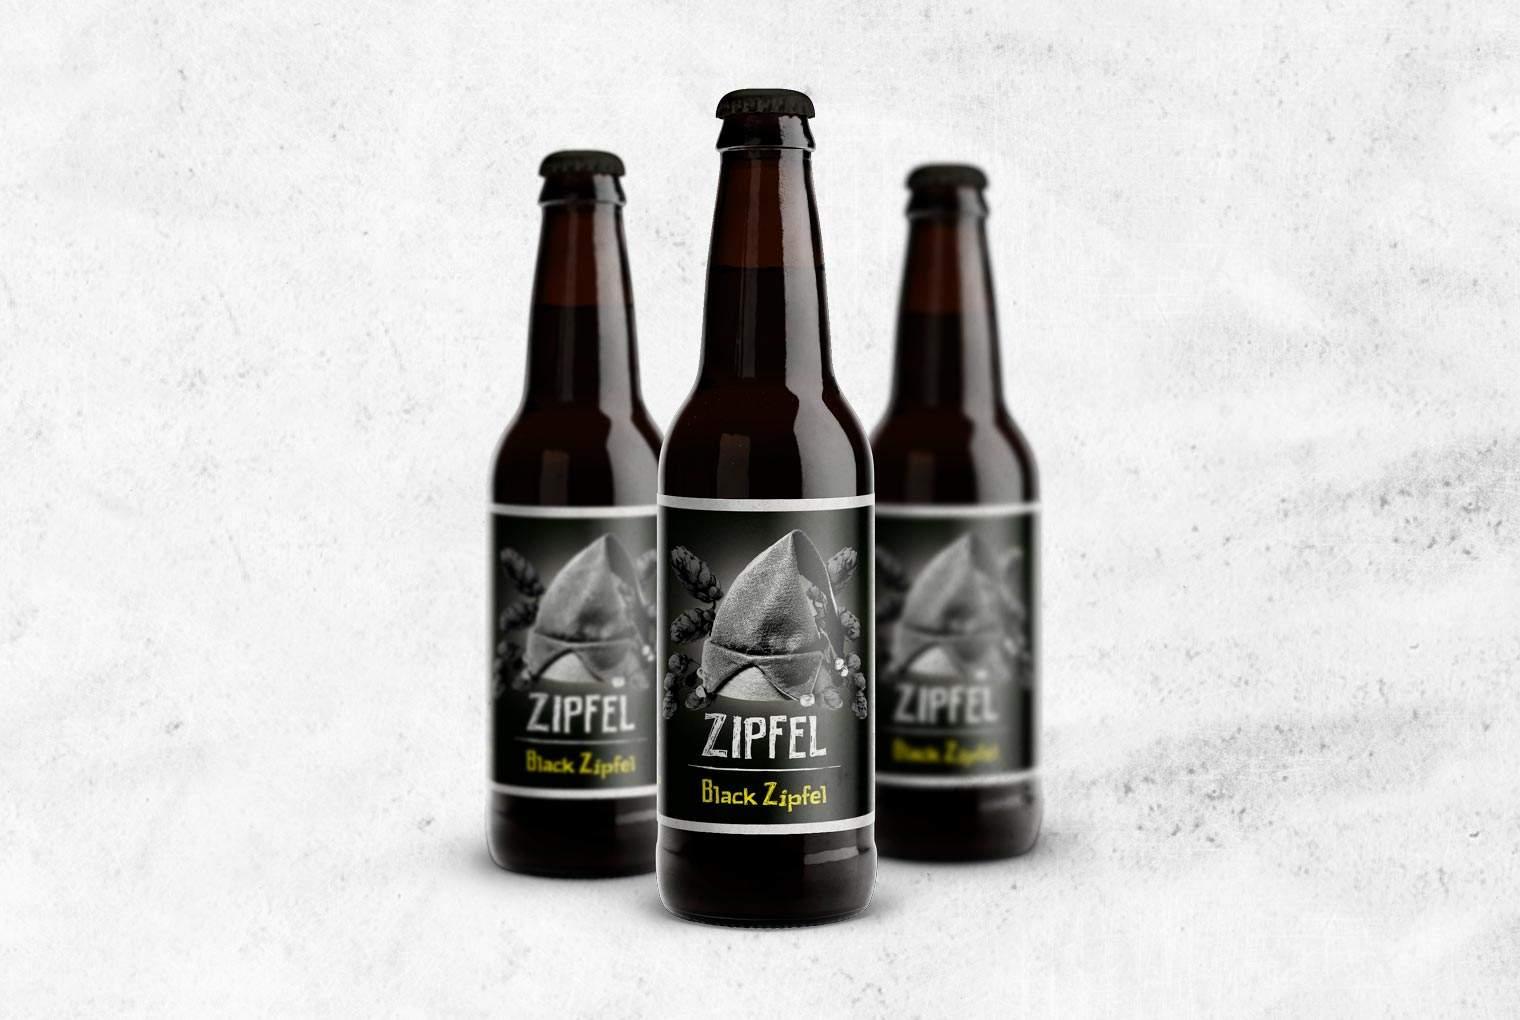 Zipfel_Bier_Black_Zipfel_2